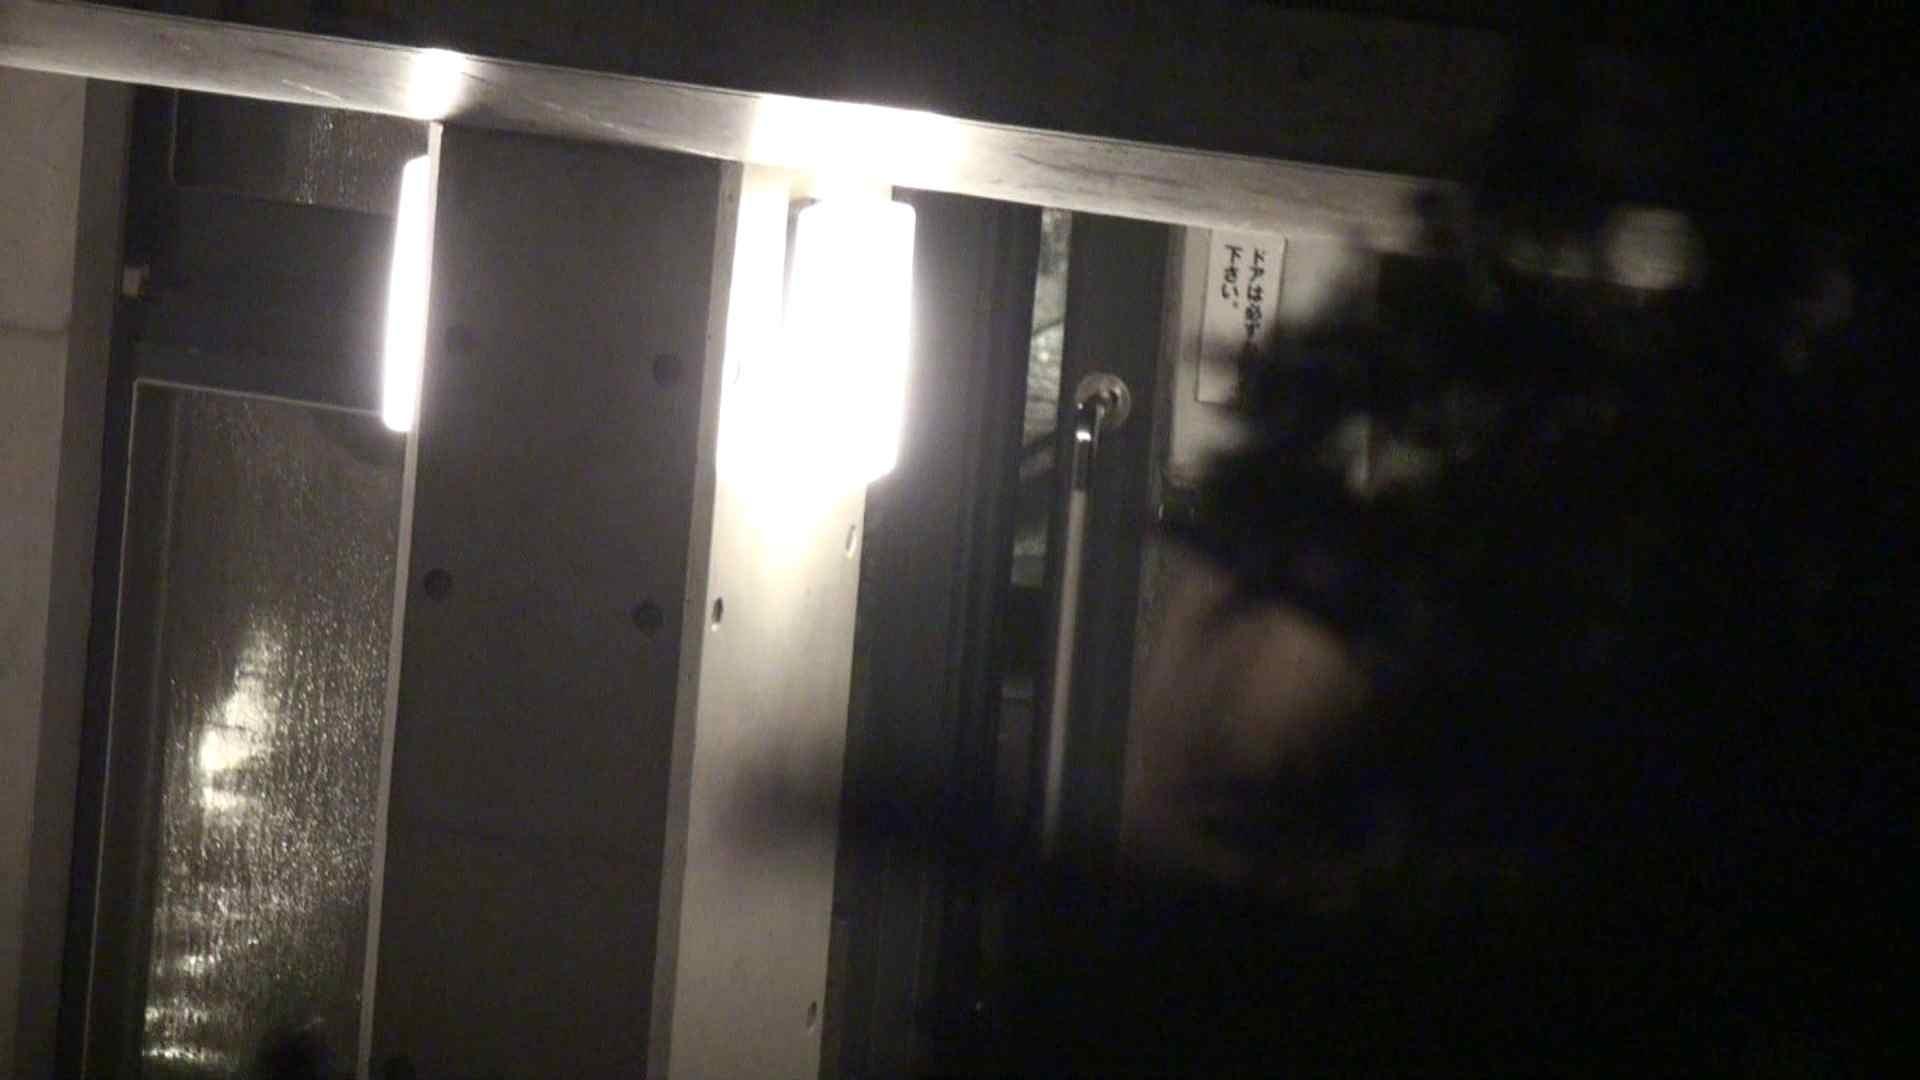 Aquaな露天風呂Vol.357 盗撮 のぞき動画画像 99連発 23